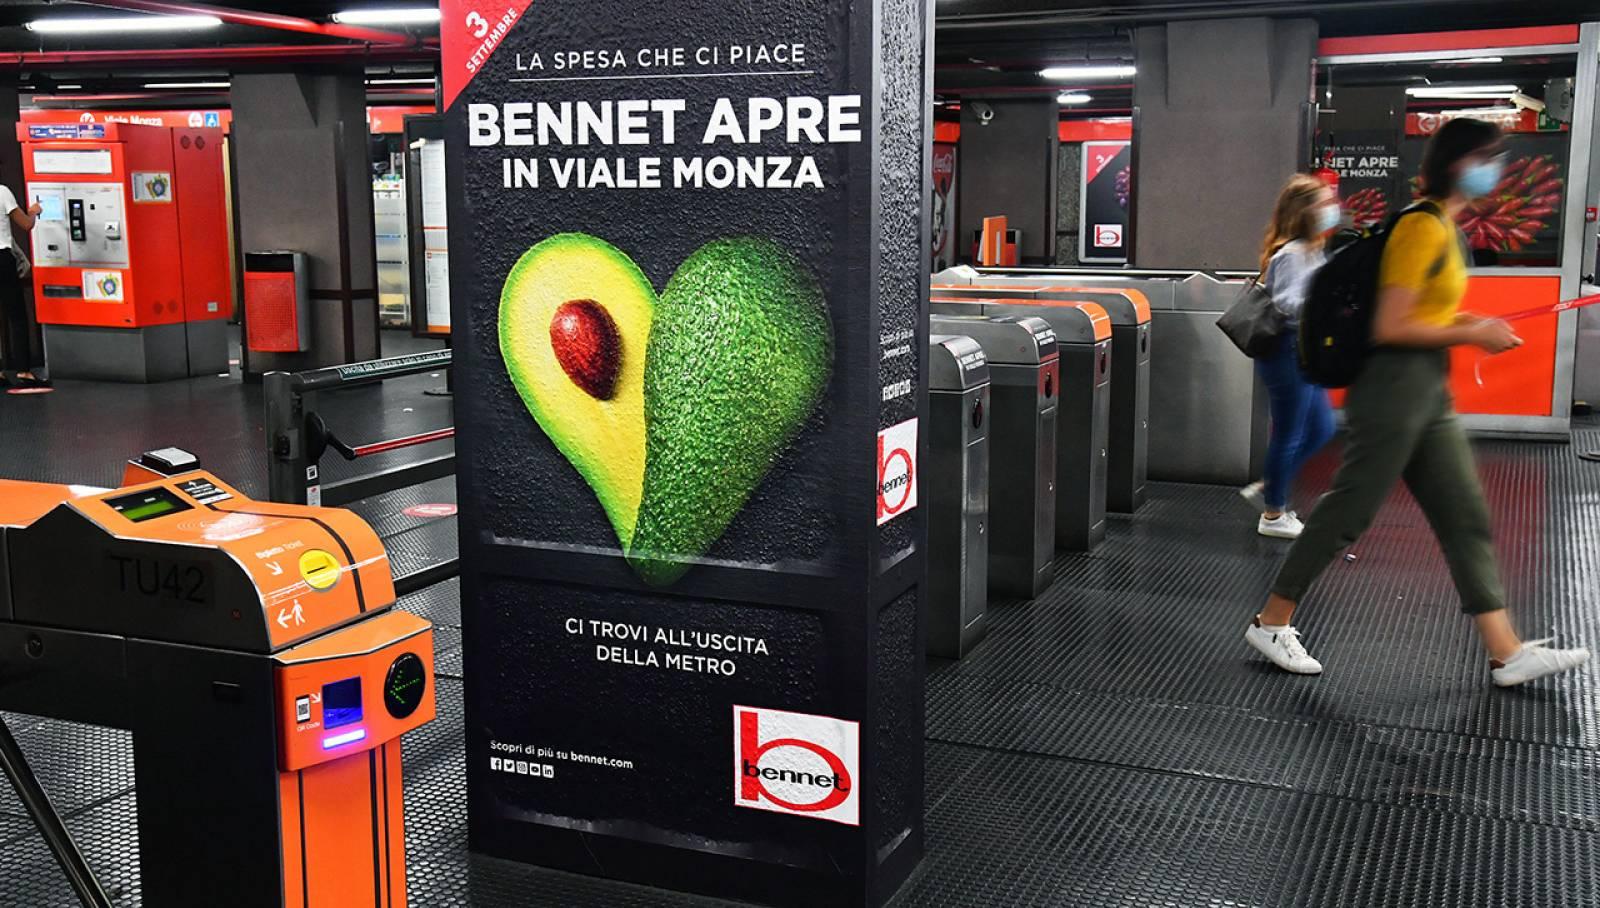 Pubblicità metro milanese IGPDecaux Station Domination per Bennet